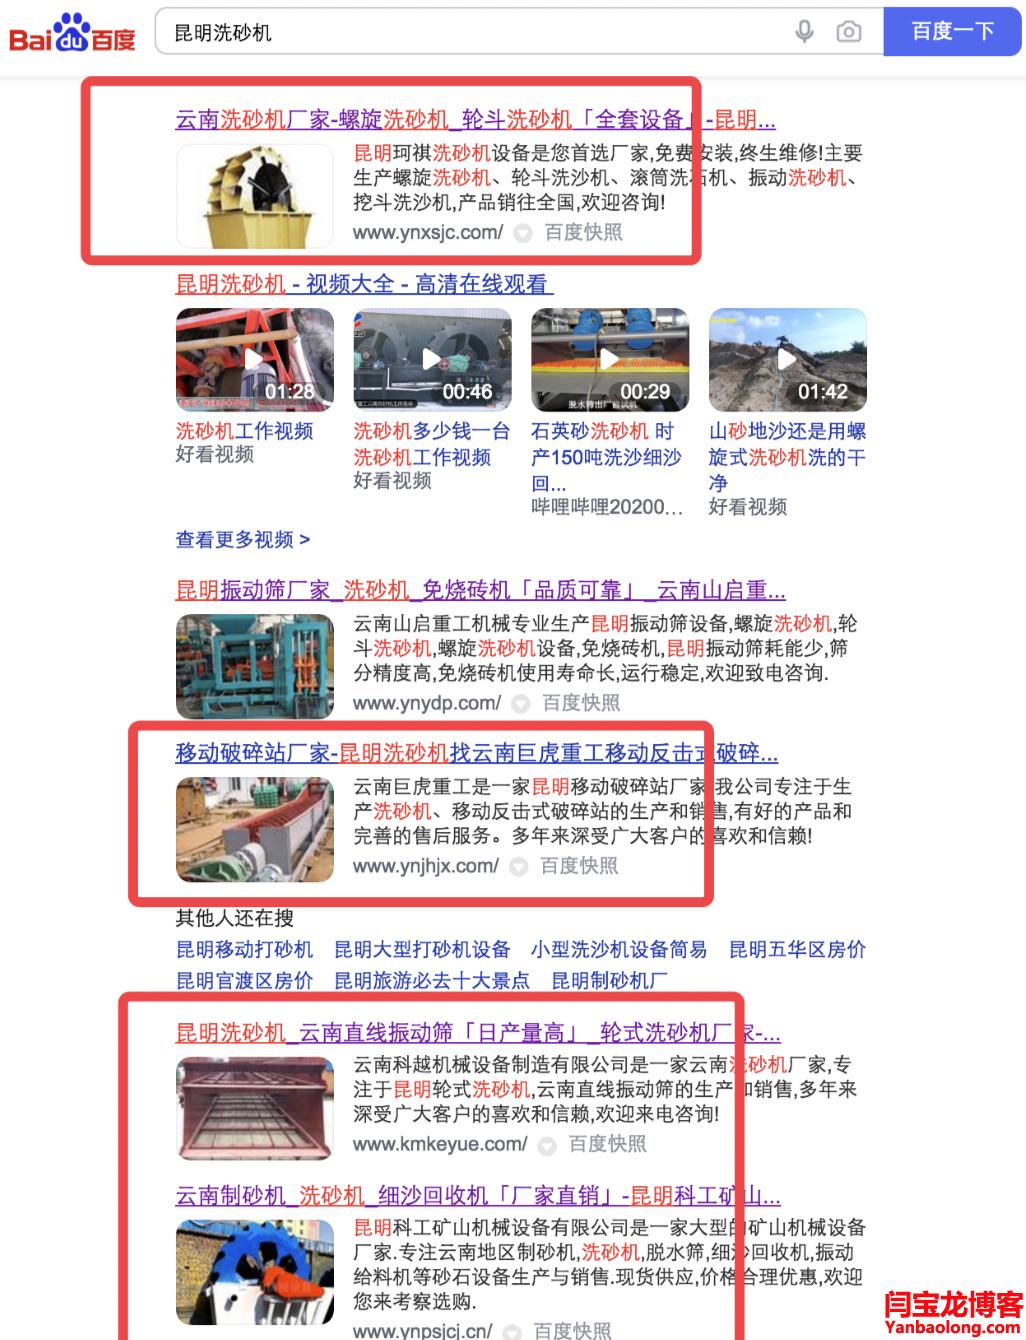 seo标题写法最新技巧:用  「」隔开 描述语  排名好